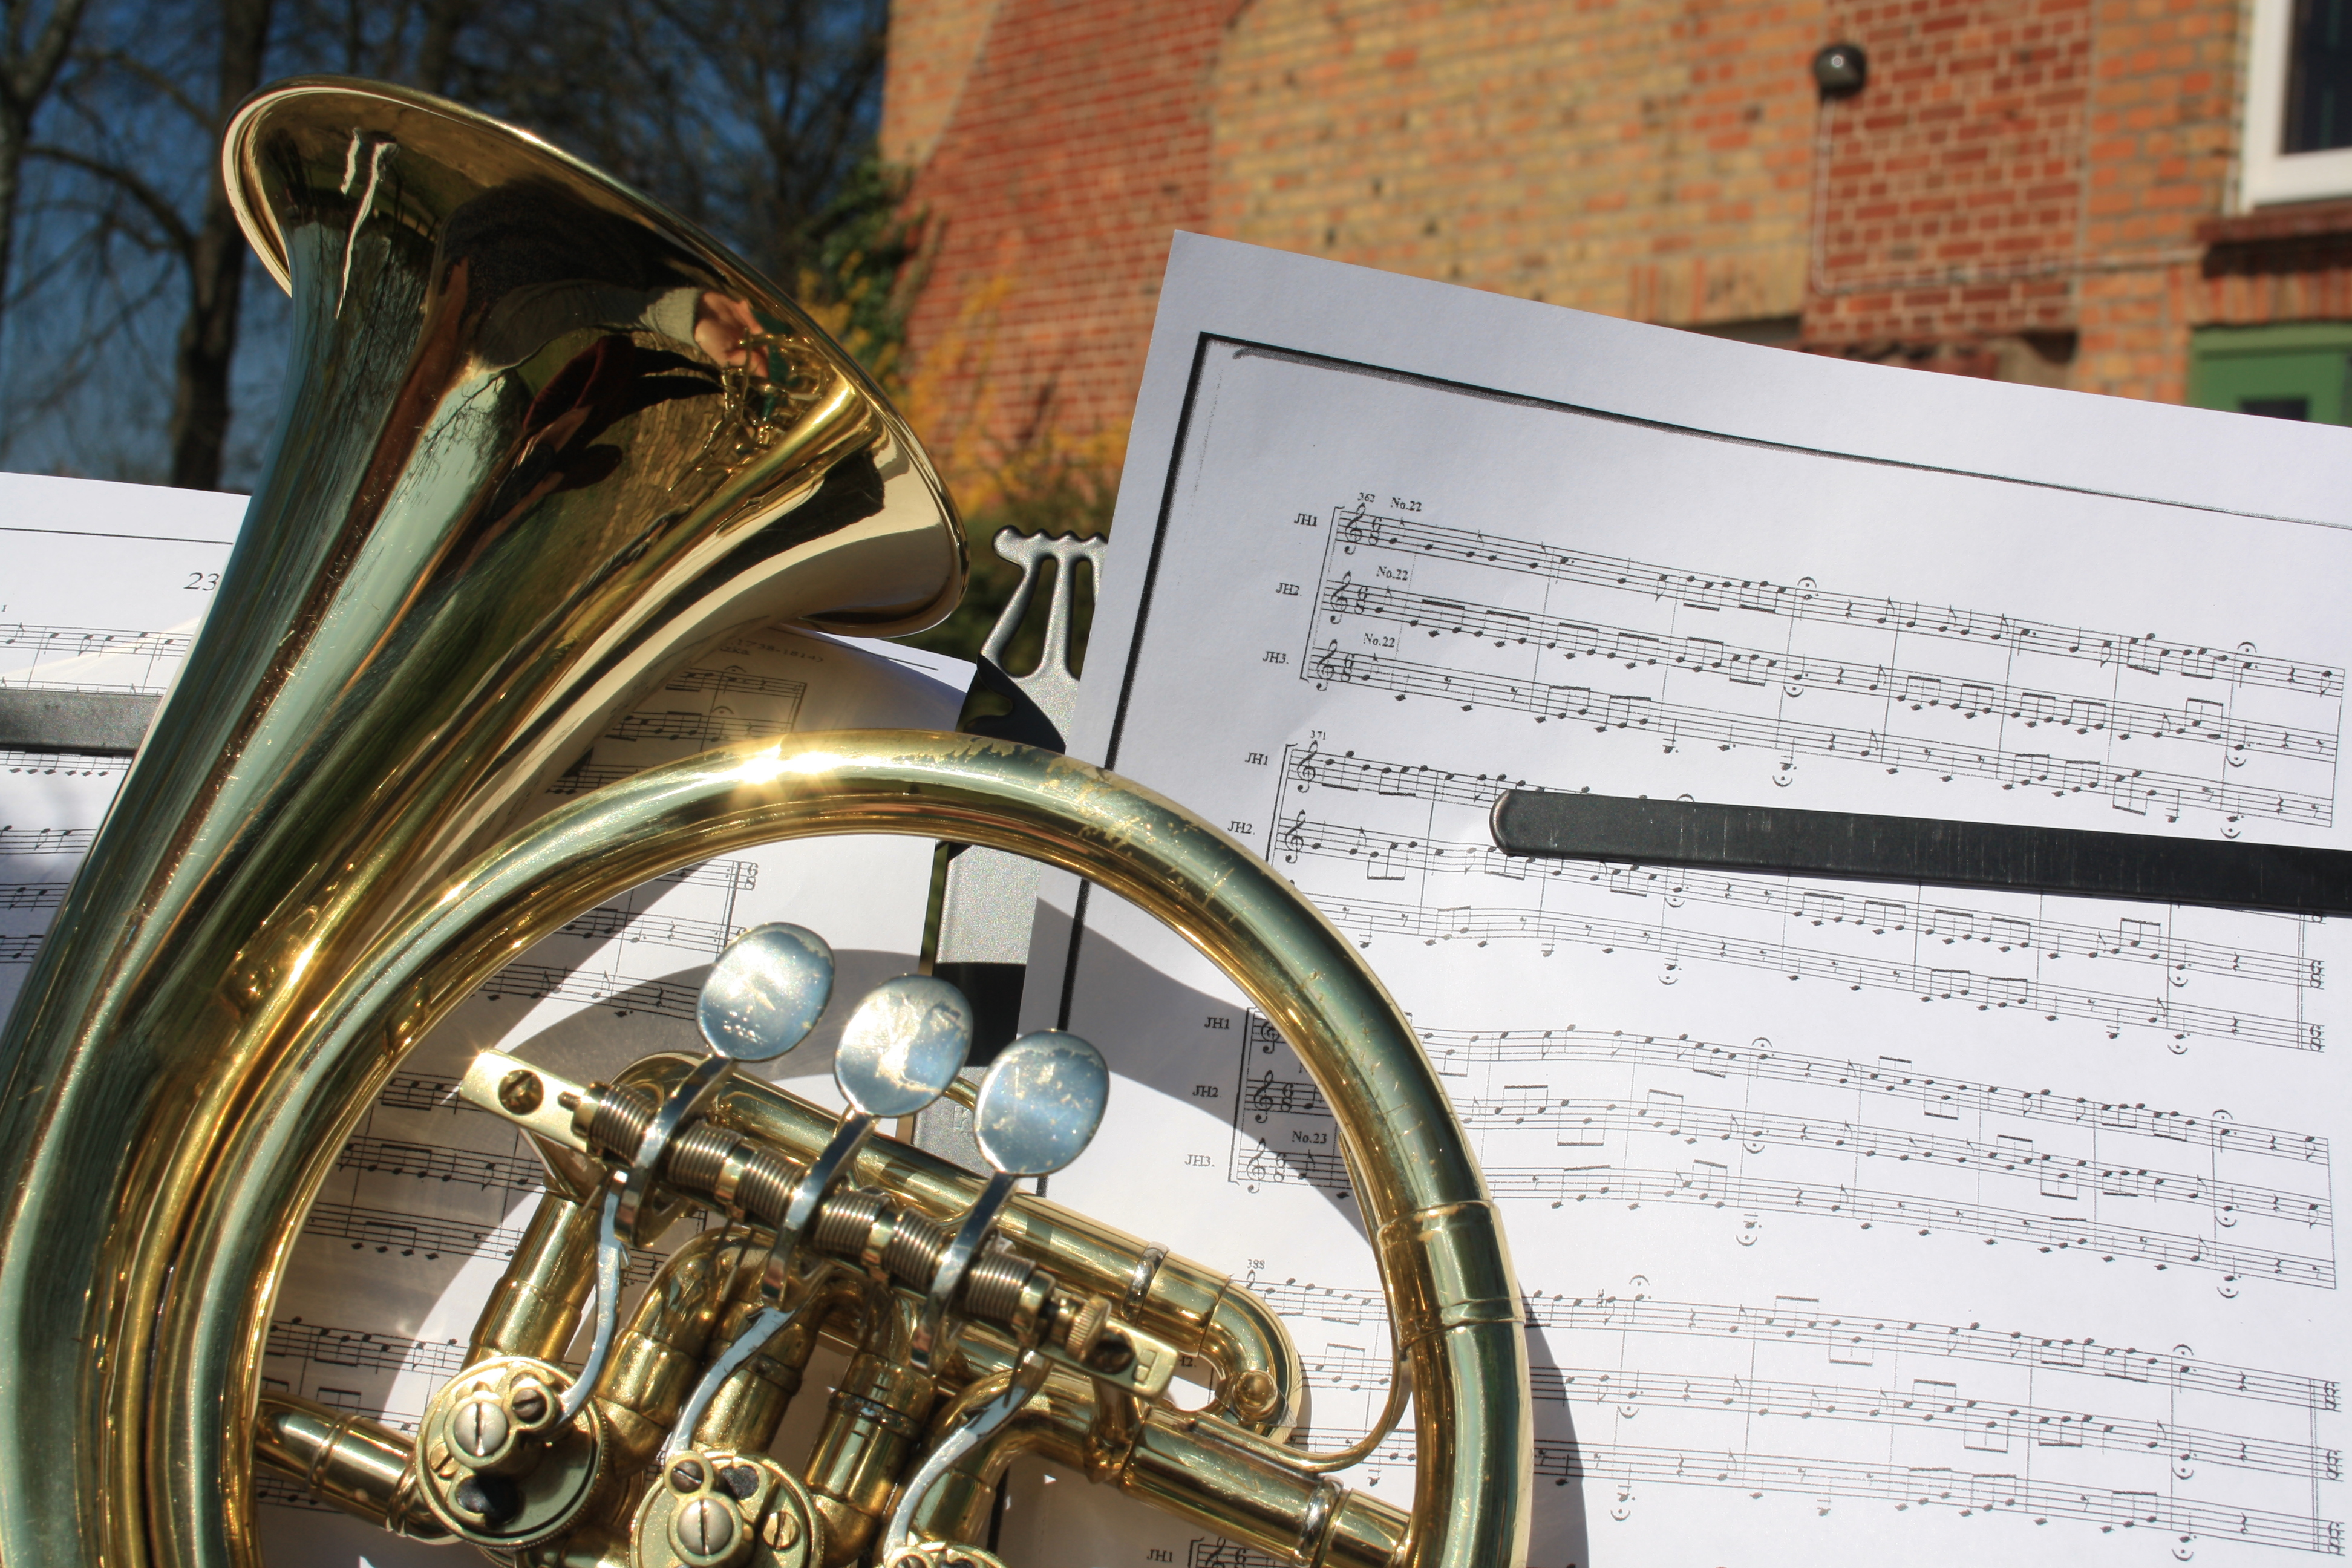 Orchesterprobe in der Jugendherberge Malchow